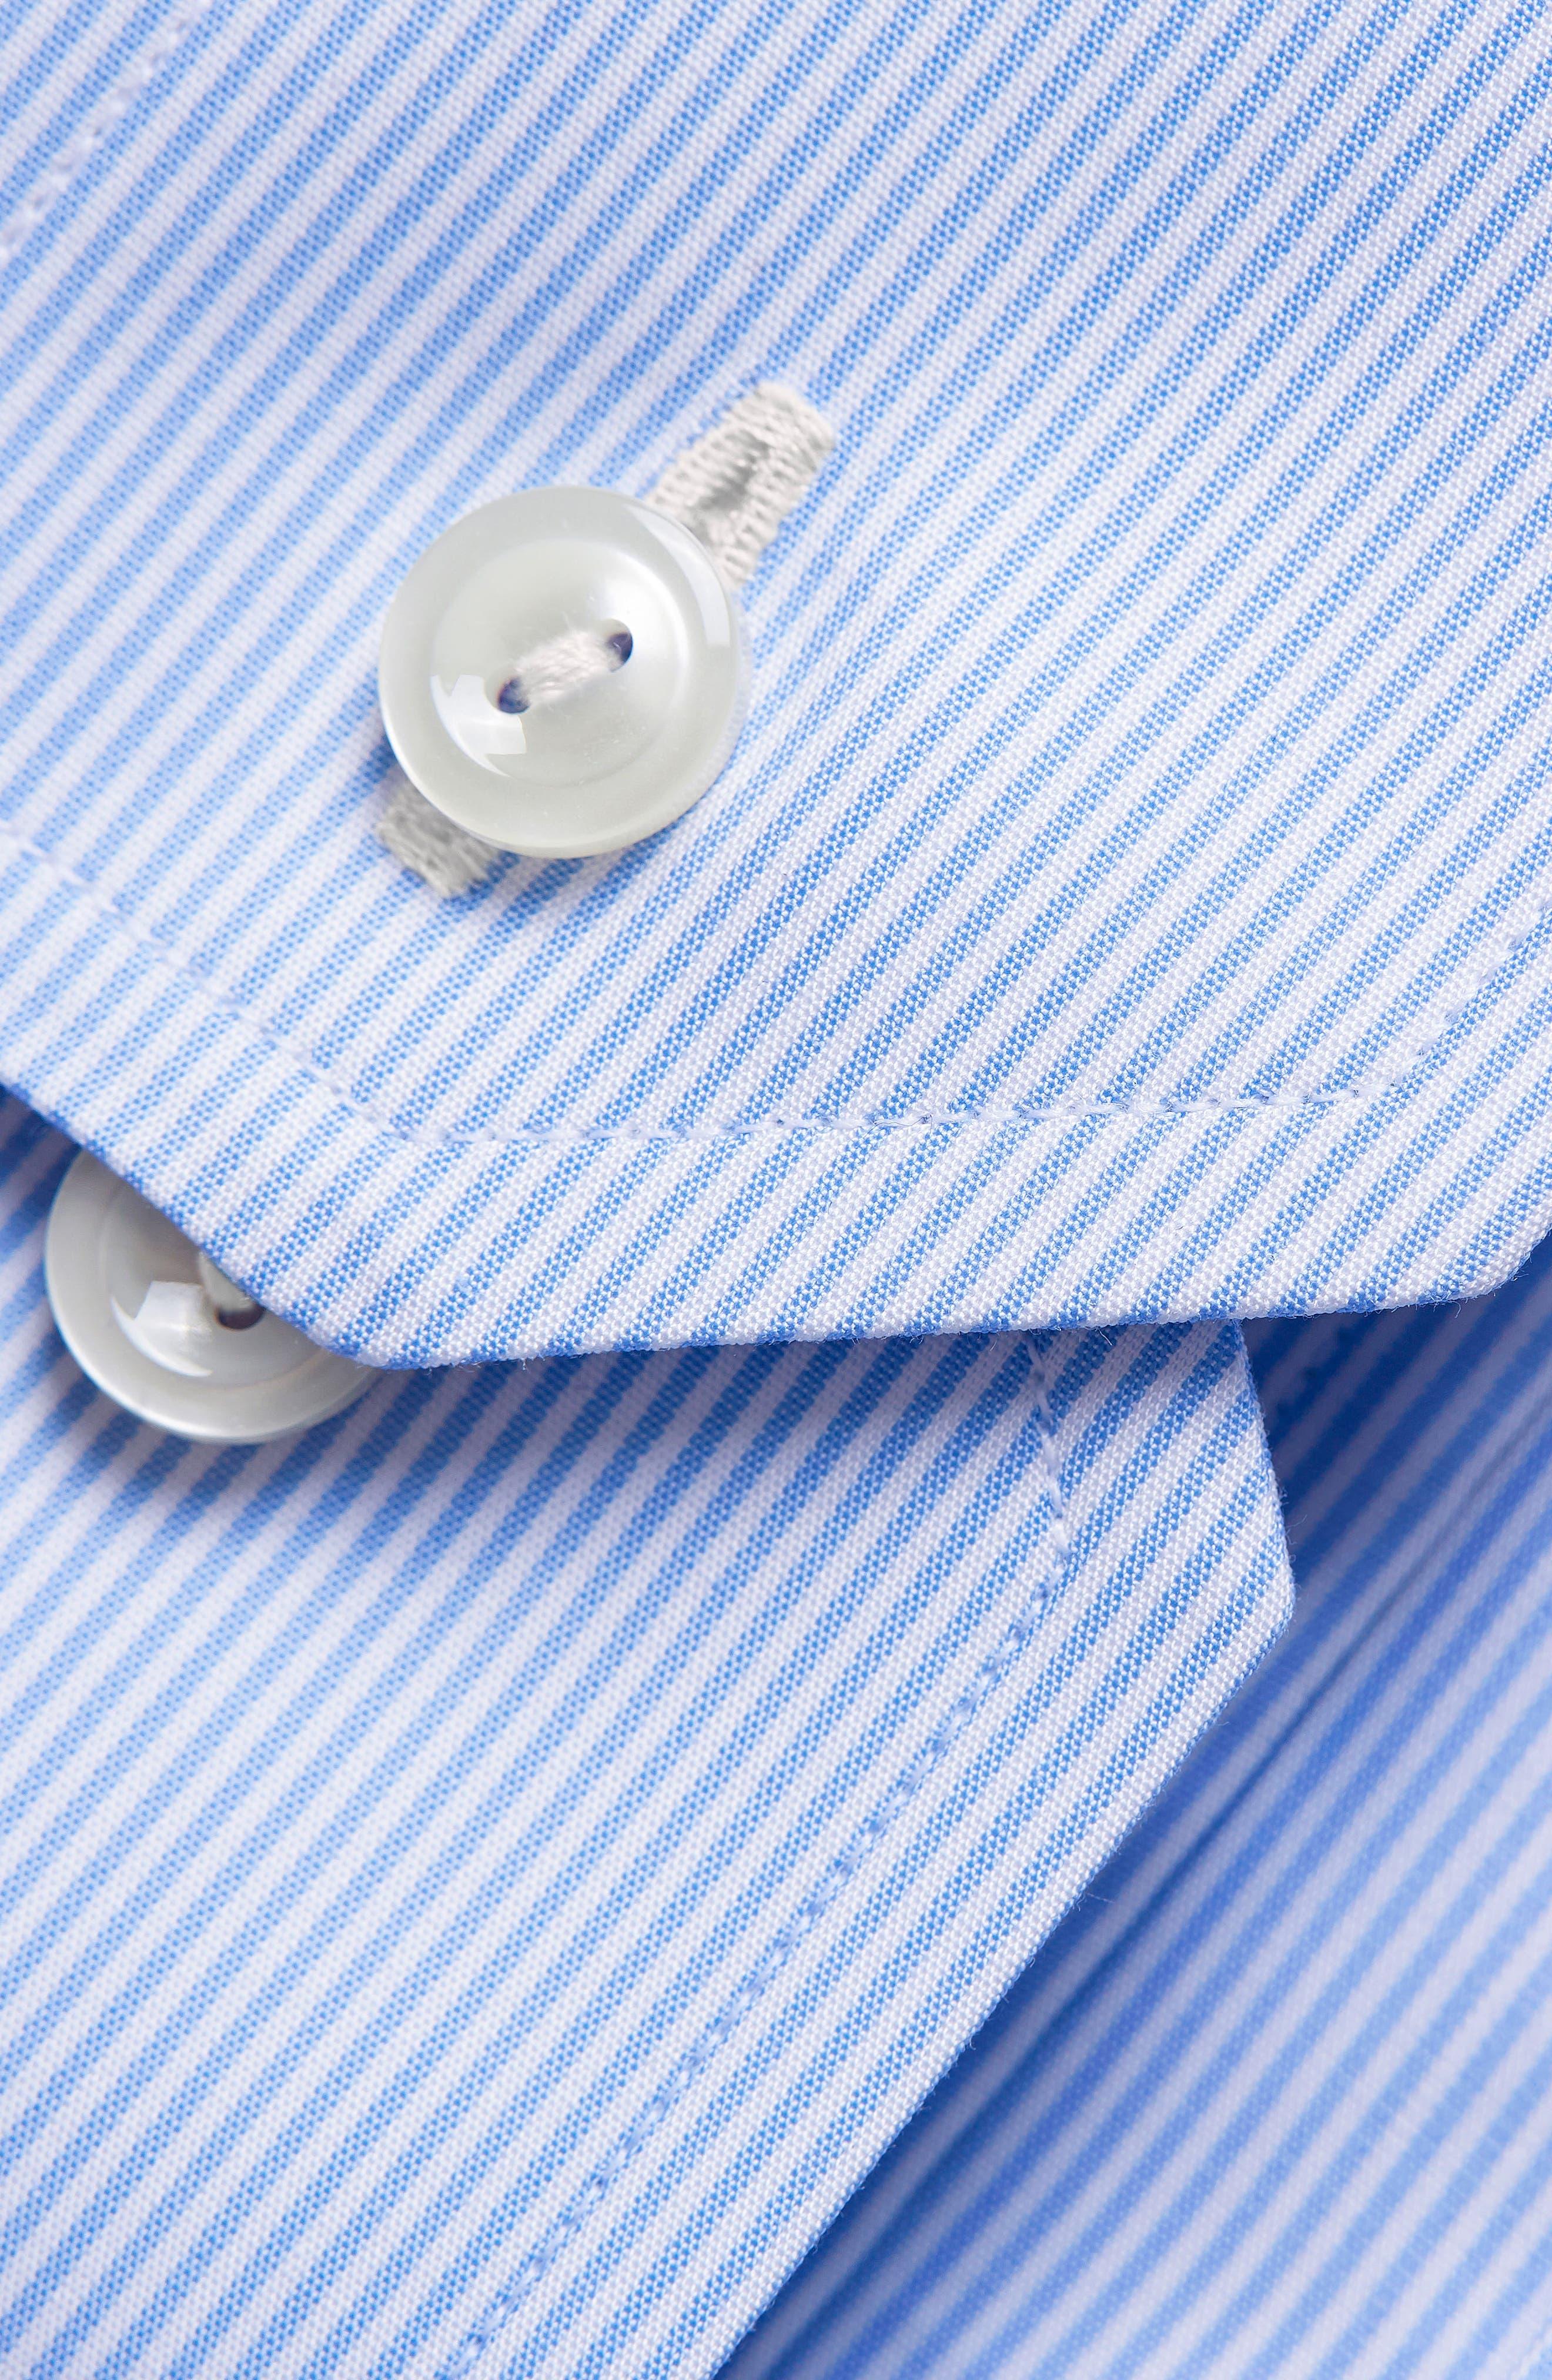 Extra Slim Fit Stripe Dress Shirt,                             Alternate thumbnail 2, color,                             LIGHT BLUE/ WHITE